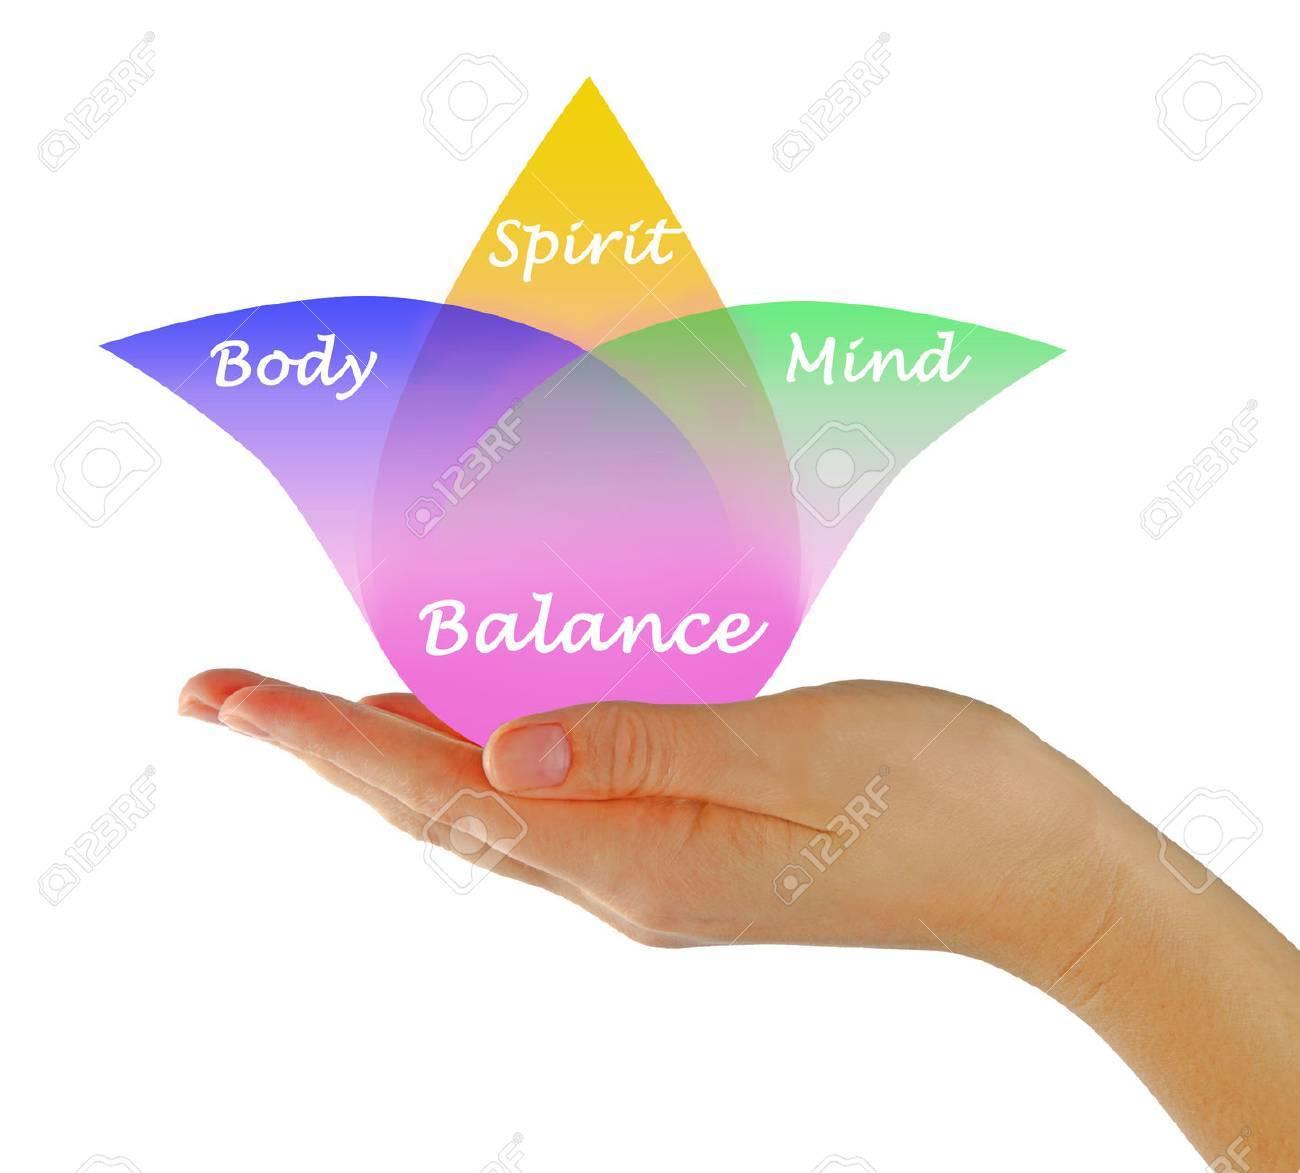 Body, spirit, mind Balance Stock Photo - 25660403